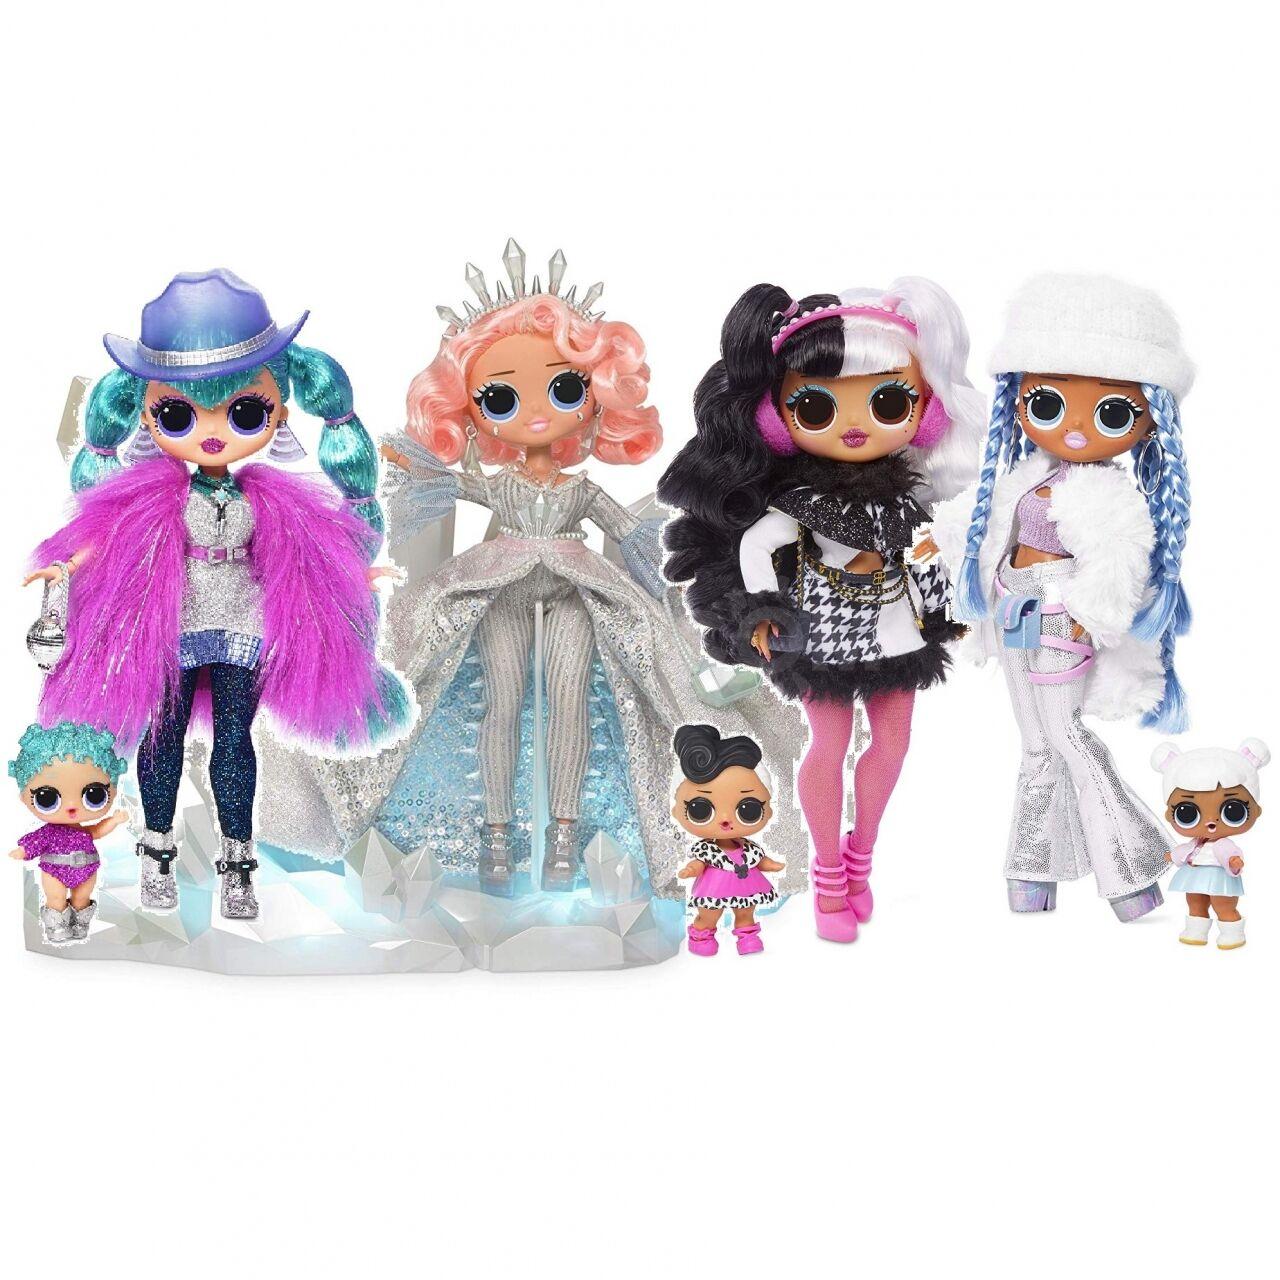 Куклы LOL OMG (ЛОЛ ОМГ) 2 волна зимняя серия, в наличии ...